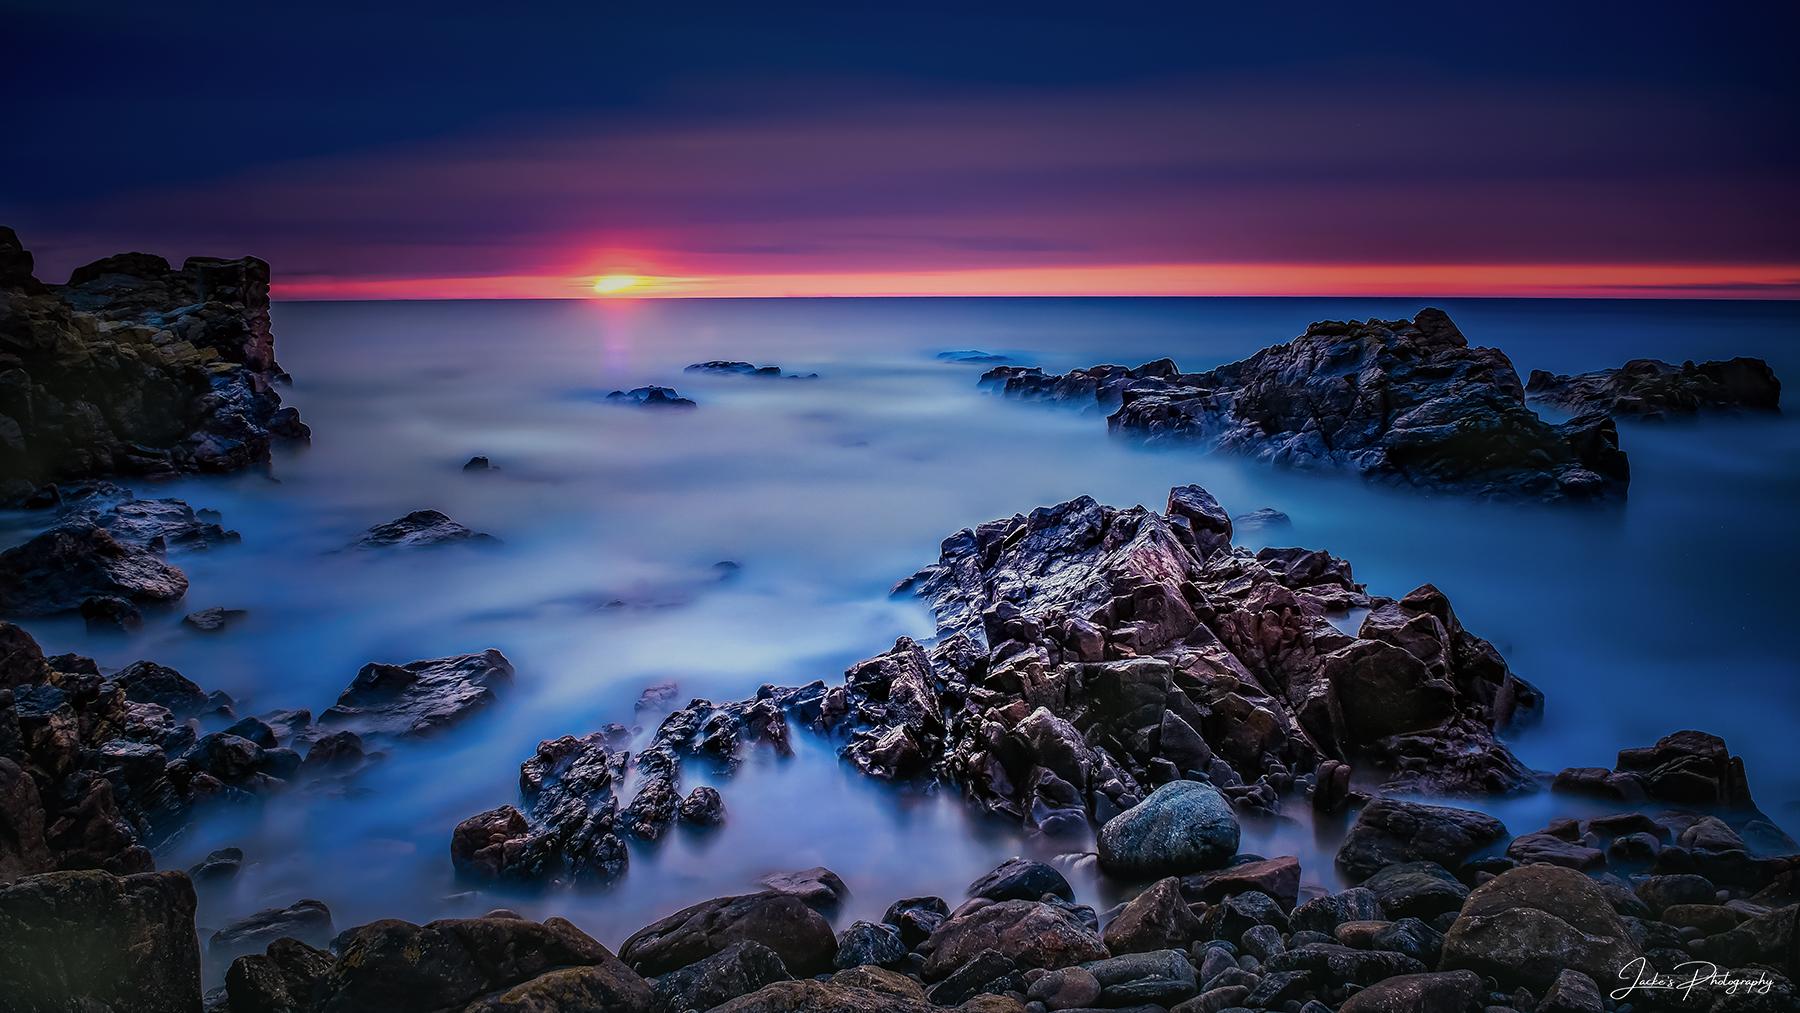 Greyhope Beach Aberdeen, United Kingdom